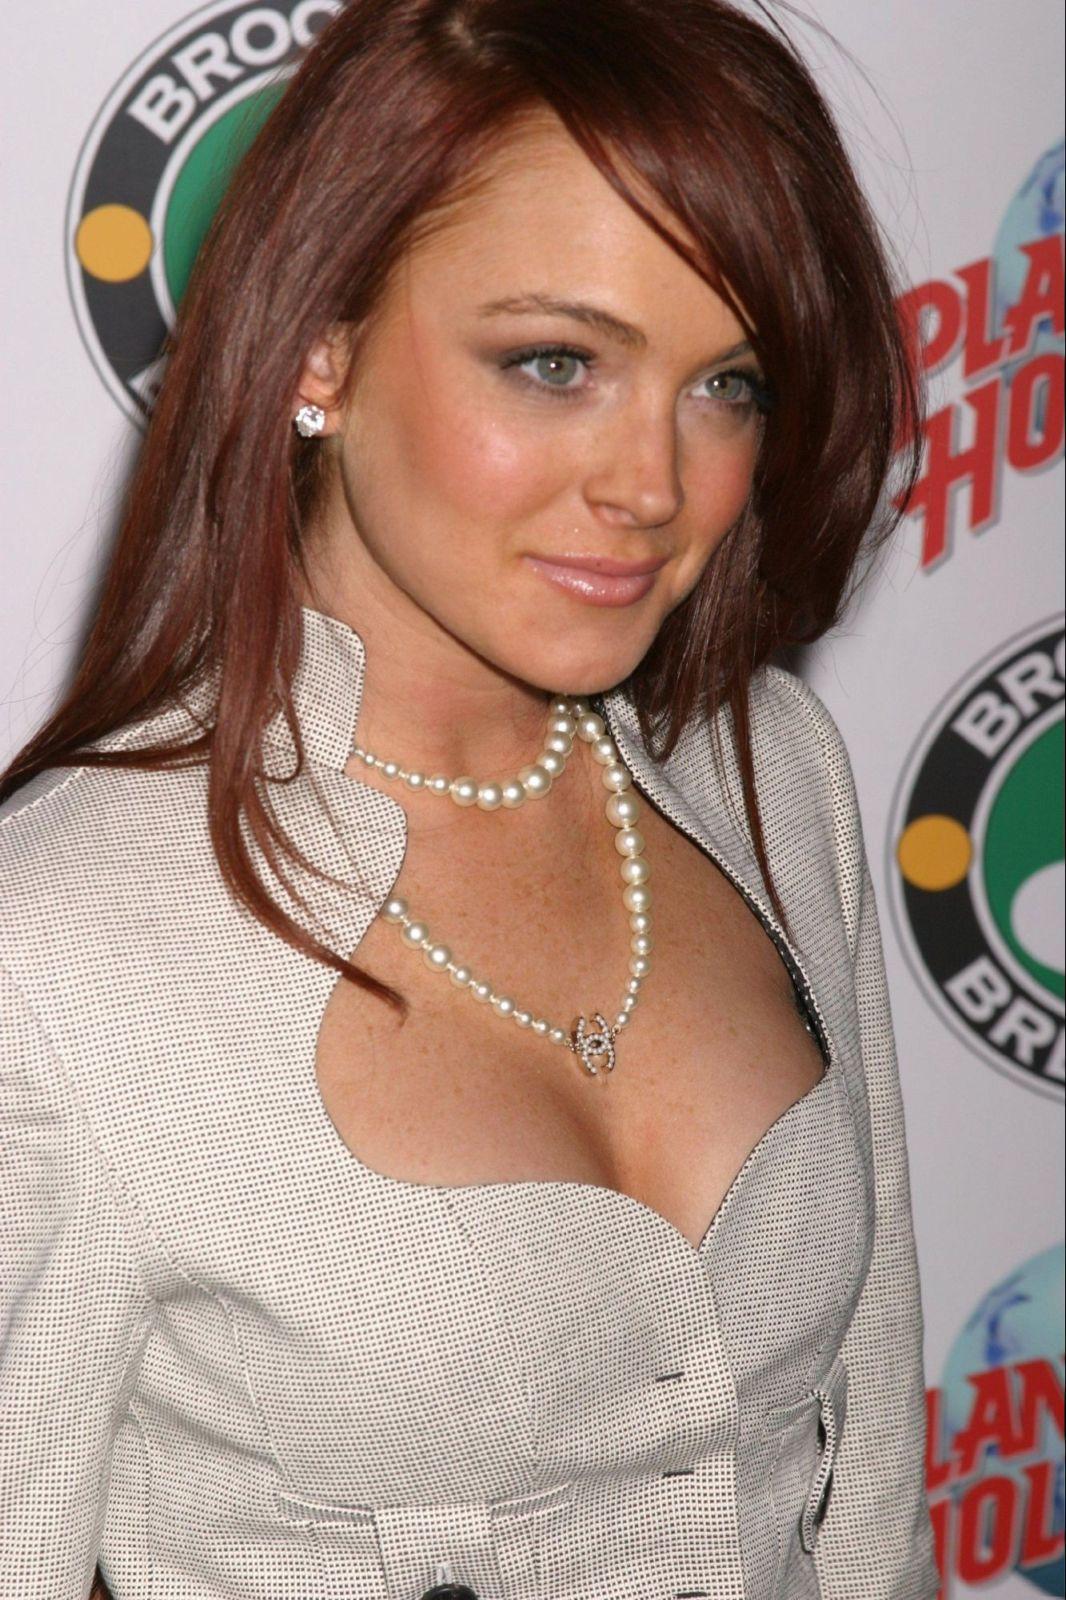 Lindsay-Lohan-photos-03.jpg (1066×1600)-Lindsay-Lohan-photos-03.jpg (1066×1600)-11